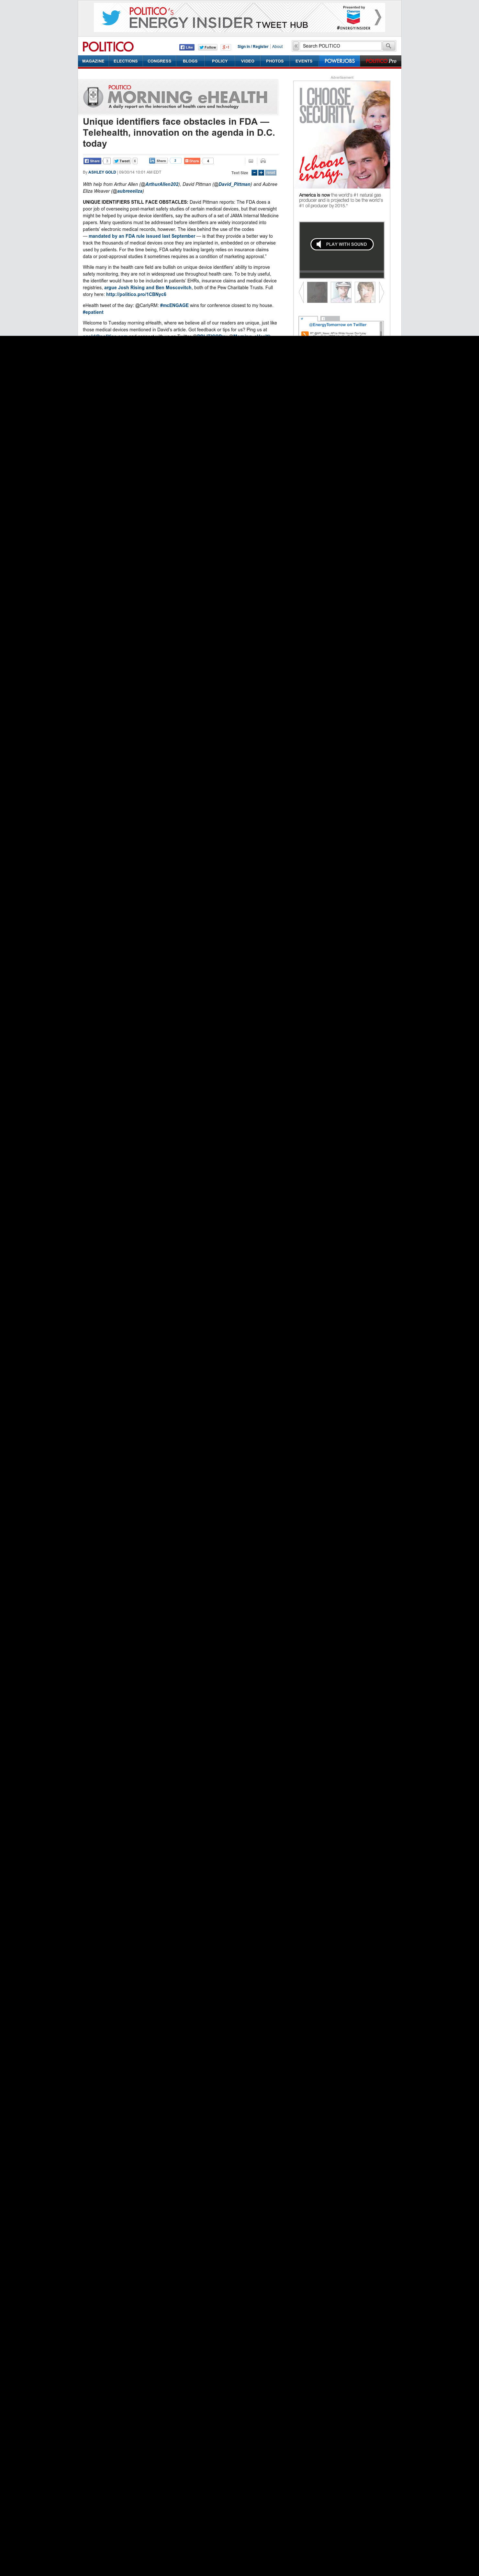 A4177b39 26c8 42f5 9bf9 3360df091f08 0c6a05d422ddd8b4c7389c5a3cc26015b1767867